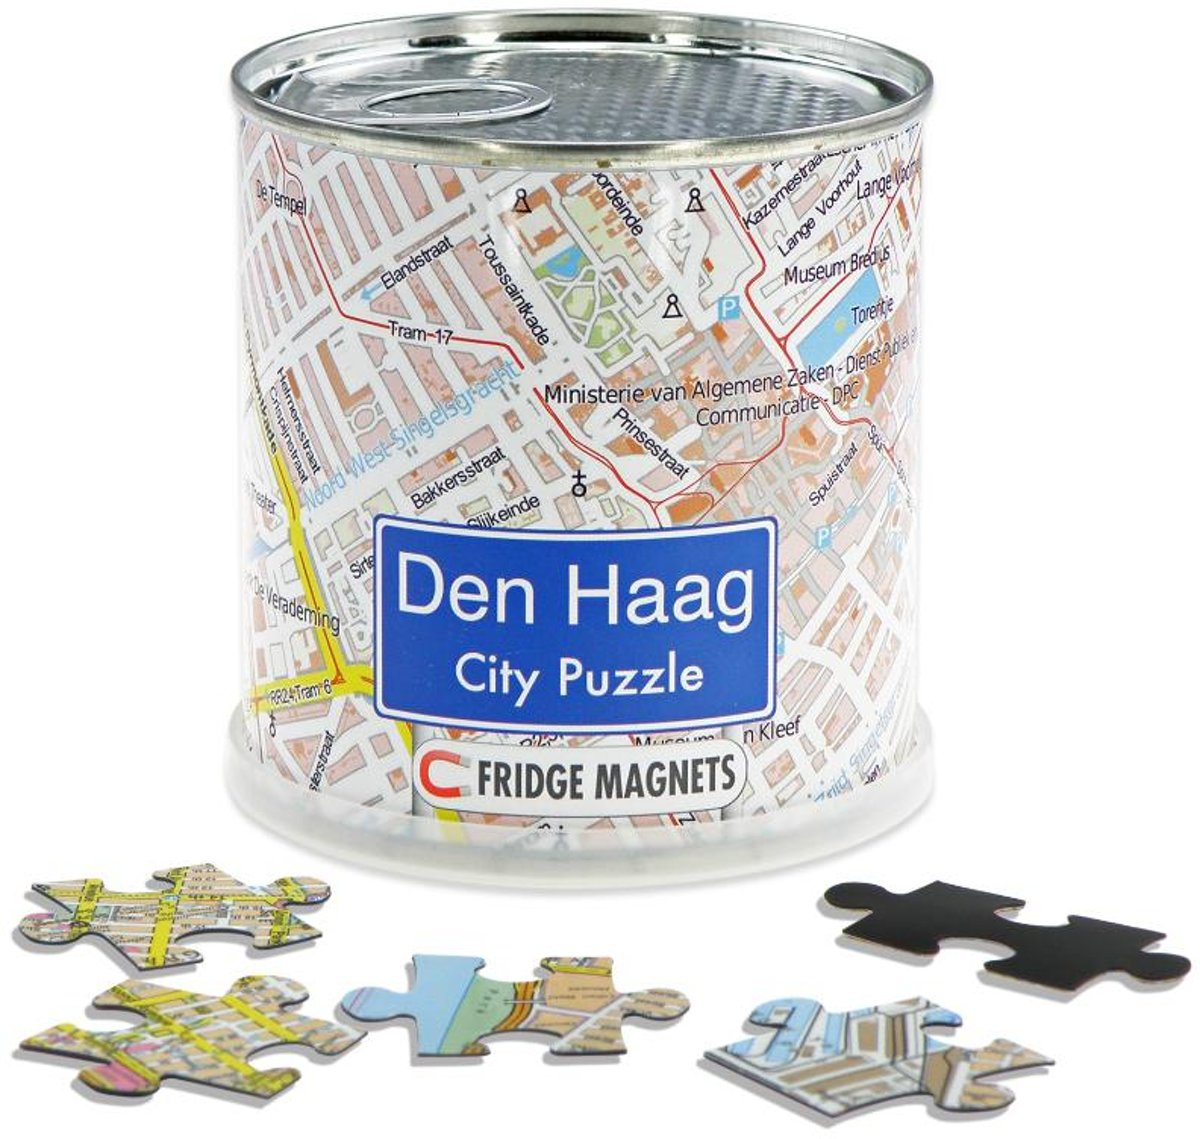 City Puzzle Den Haag - Puzzel - Magnetisch - 100 puzzelstukjes